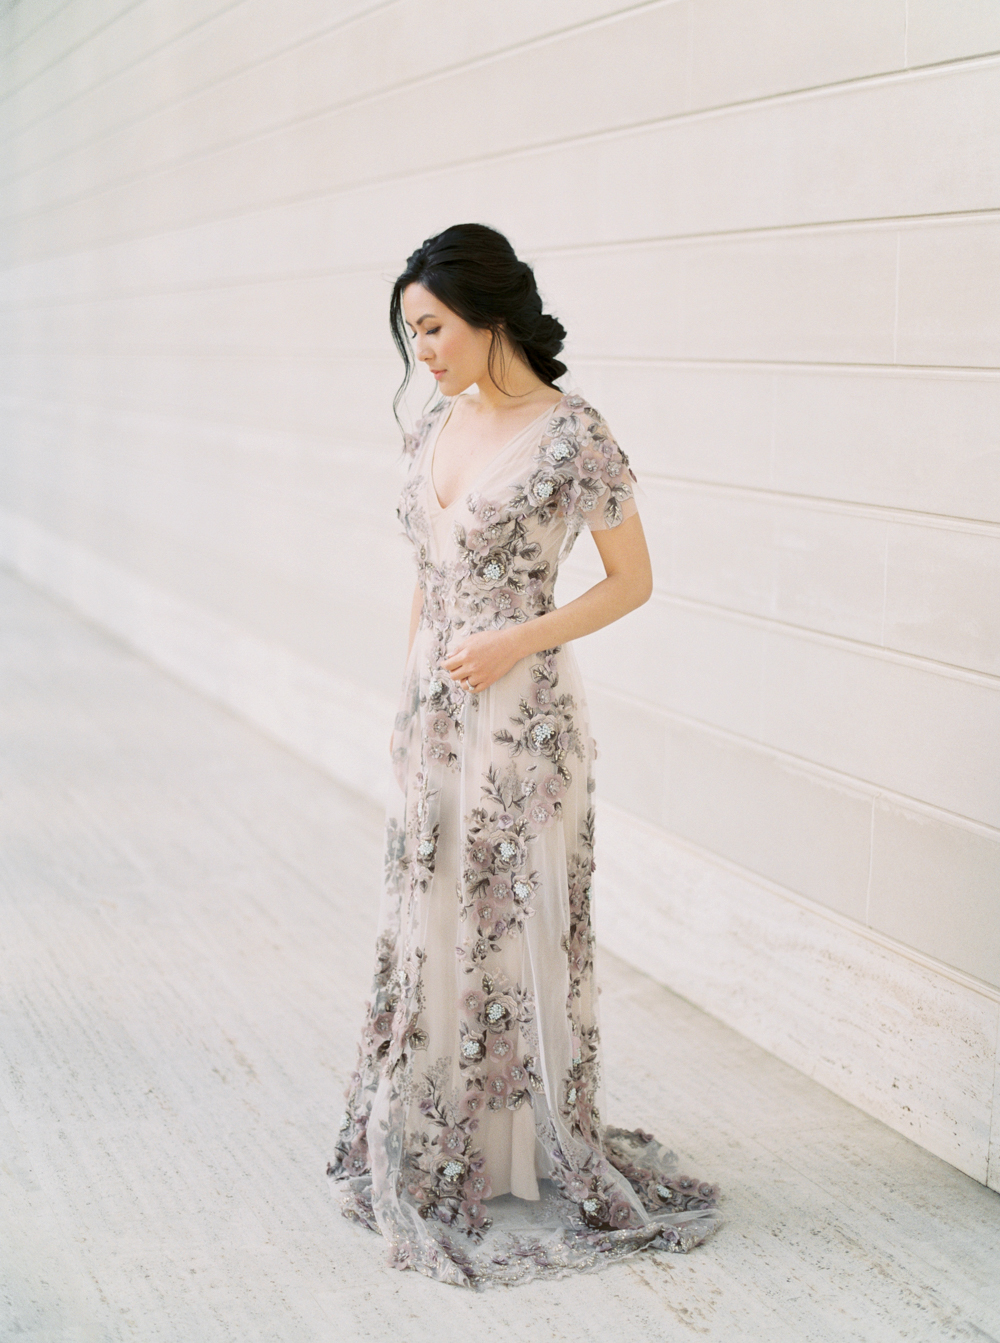 Niagara-Wedding-Photographer-California-film-fine-art-122.jpg